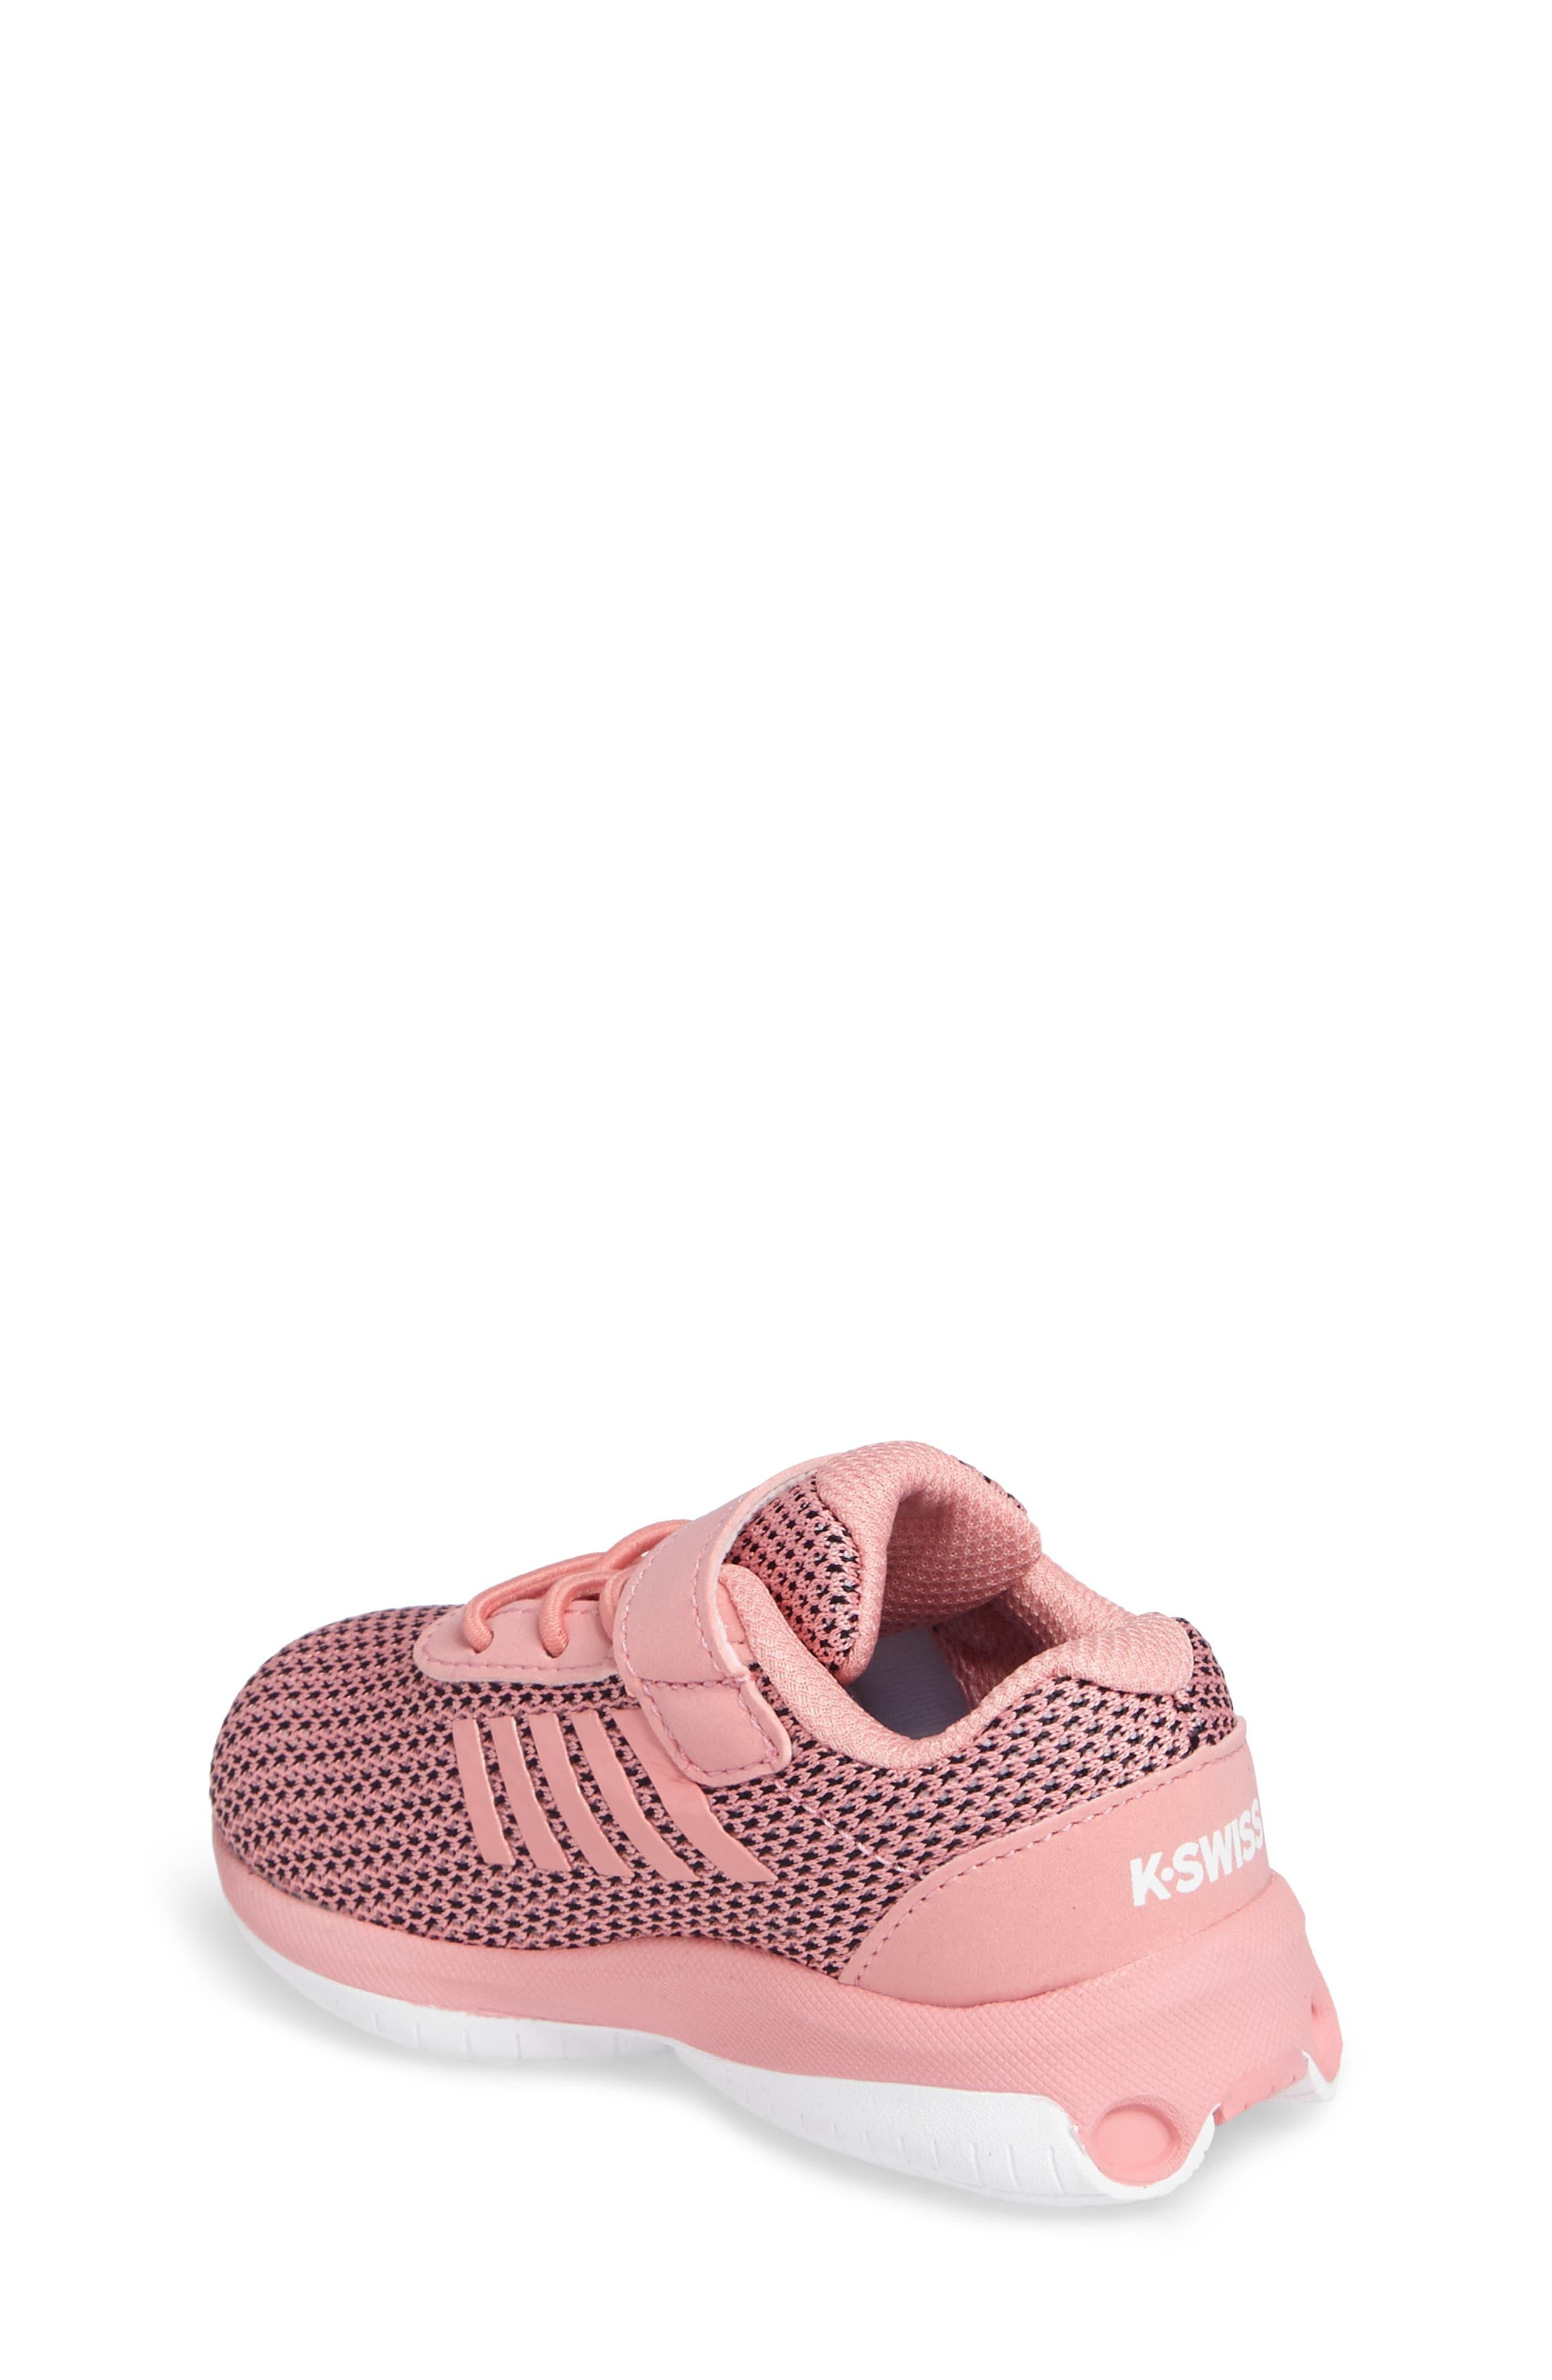 Alternate Image 2  - K-Swiss Tubes Infinity Sneaker (Baby, Walker & Toddler)